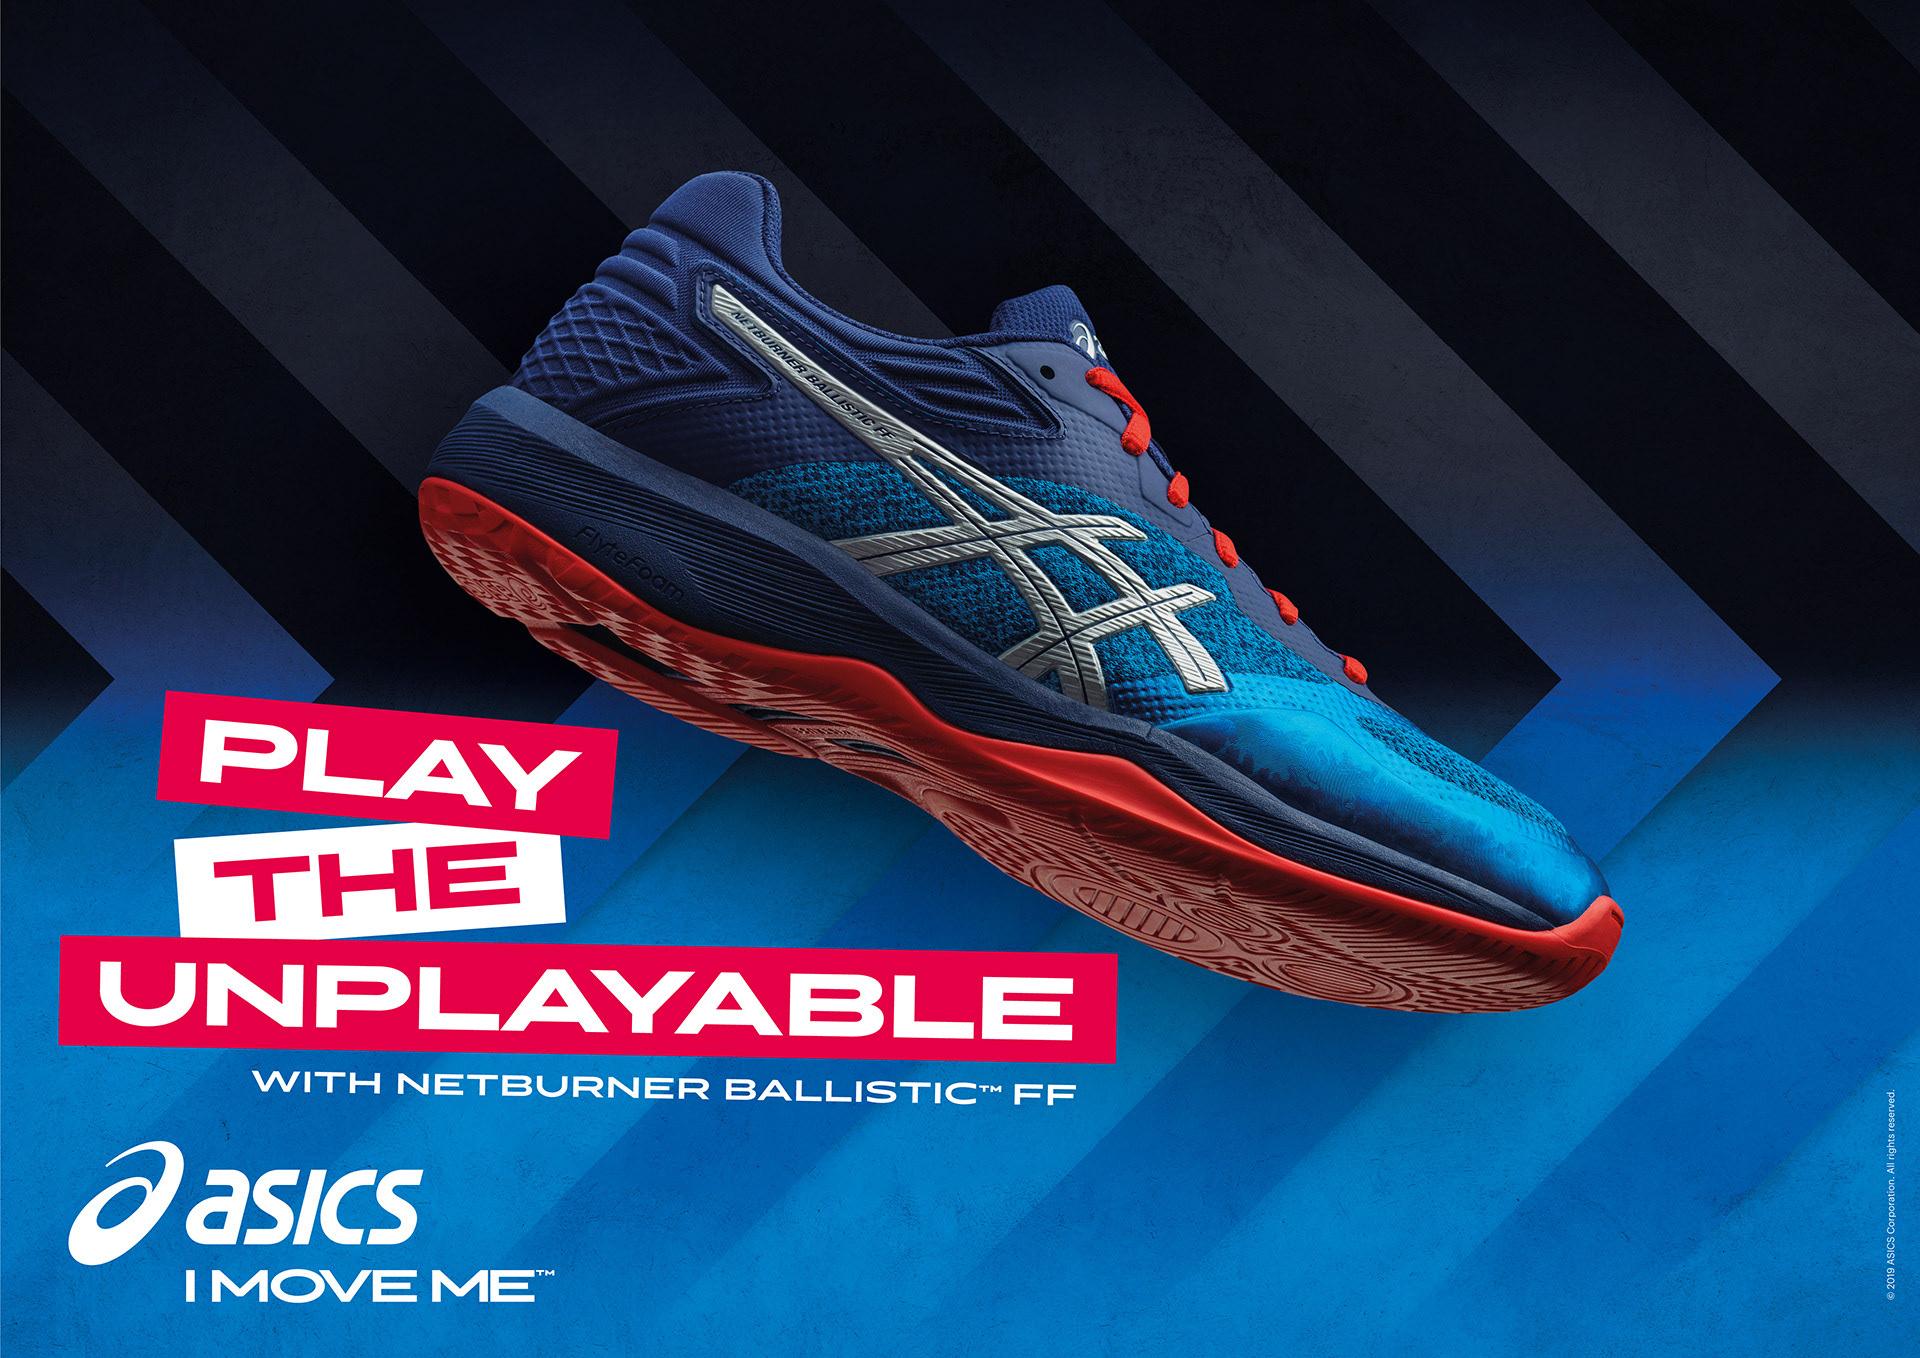 Asics SS19 Handball Campaign on Behance